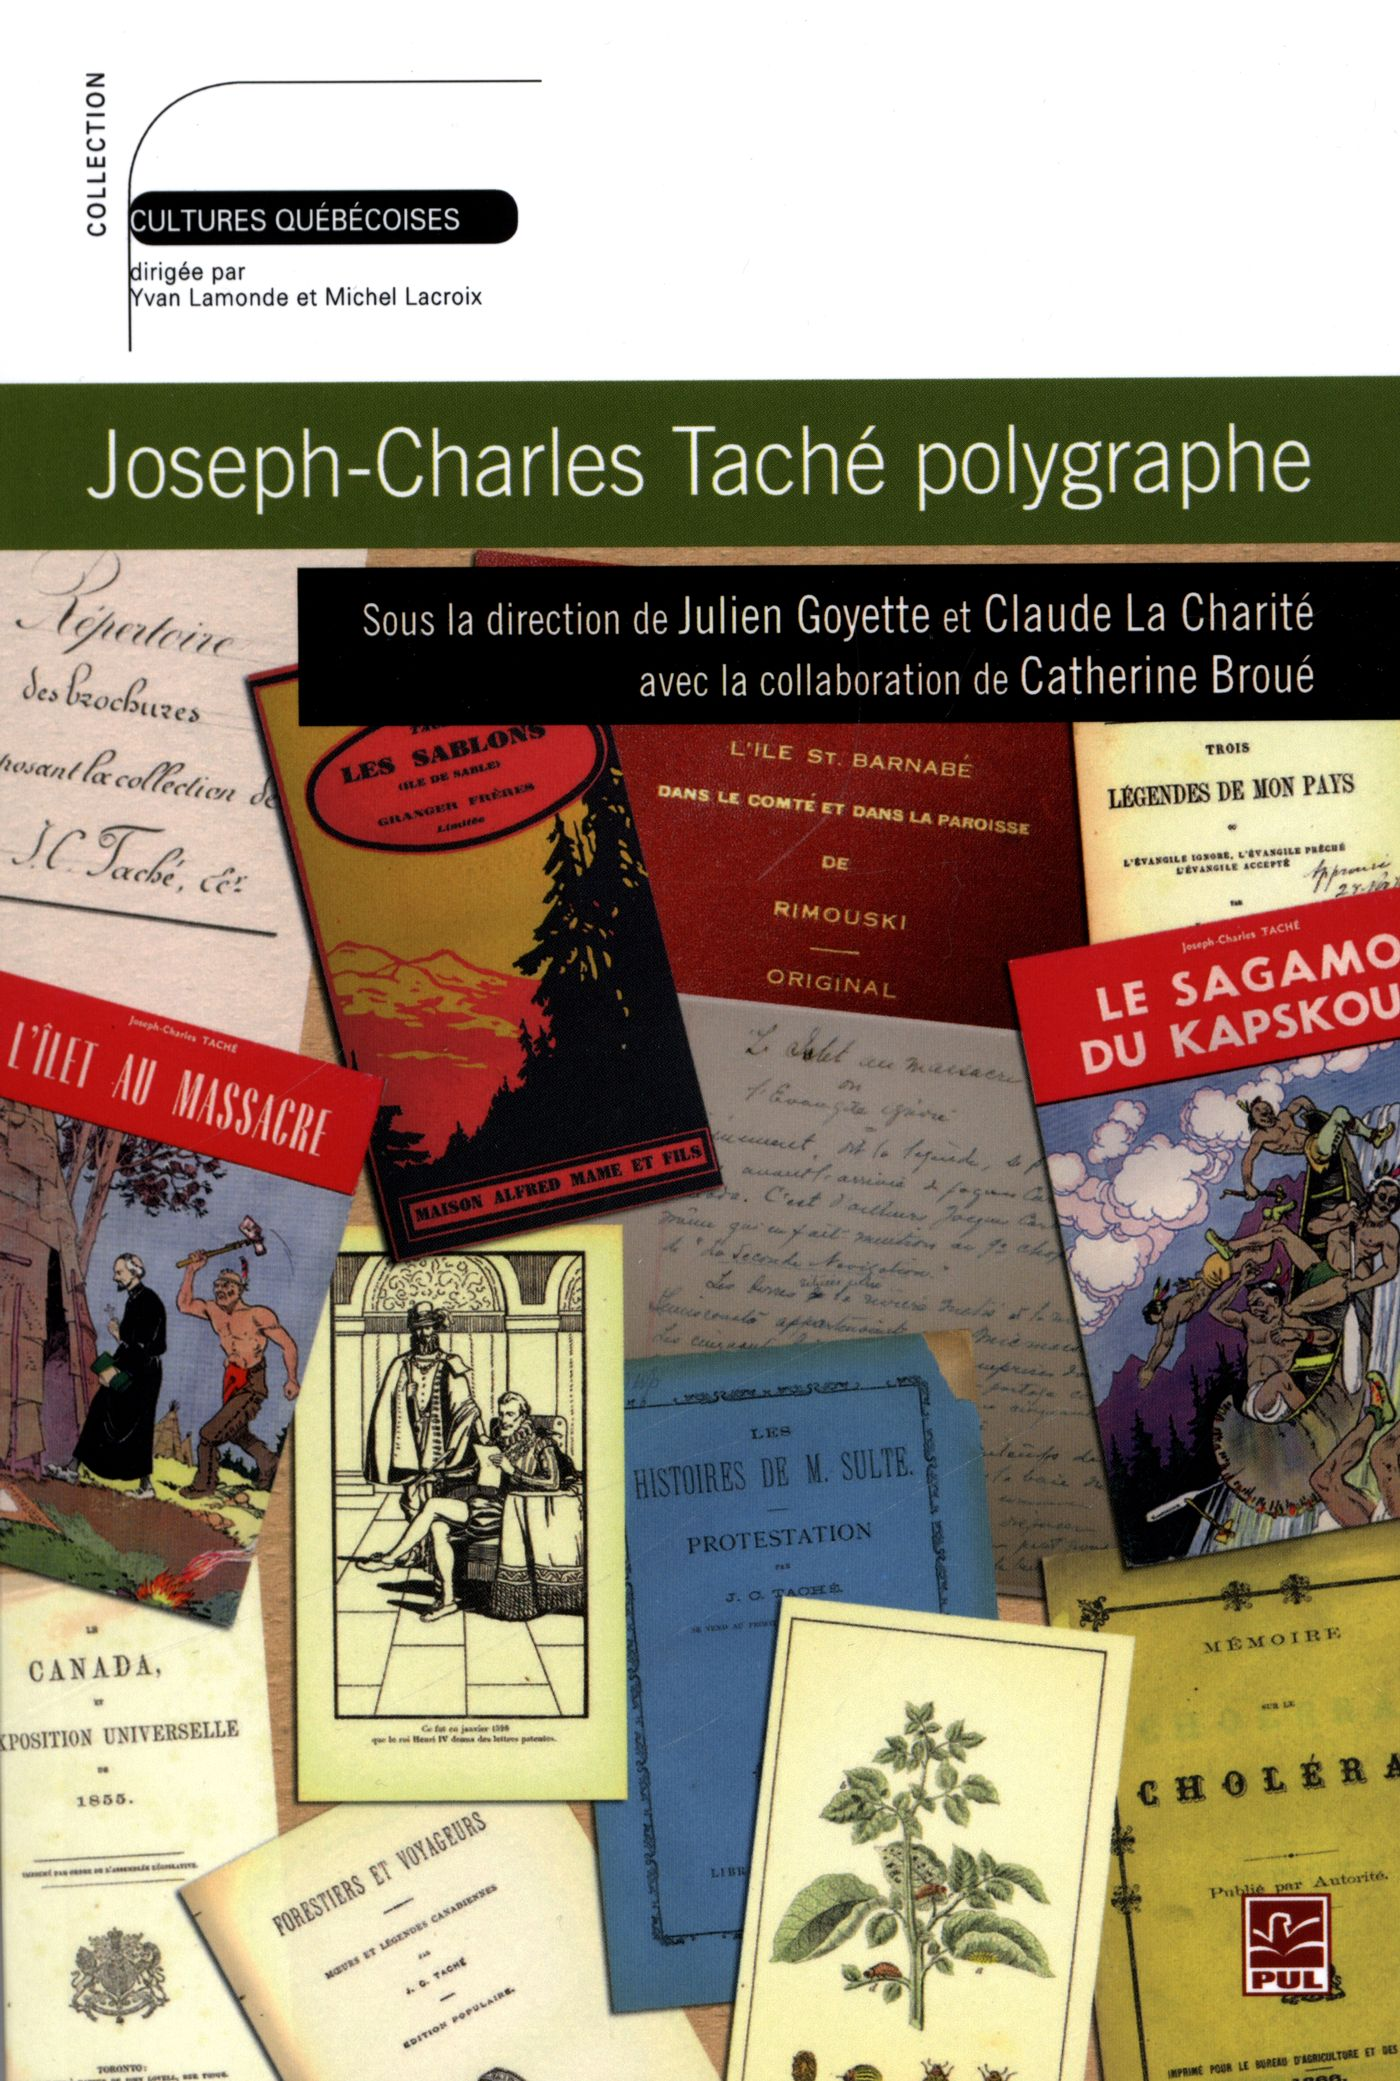 Joseph-Charles Taché polygraphe